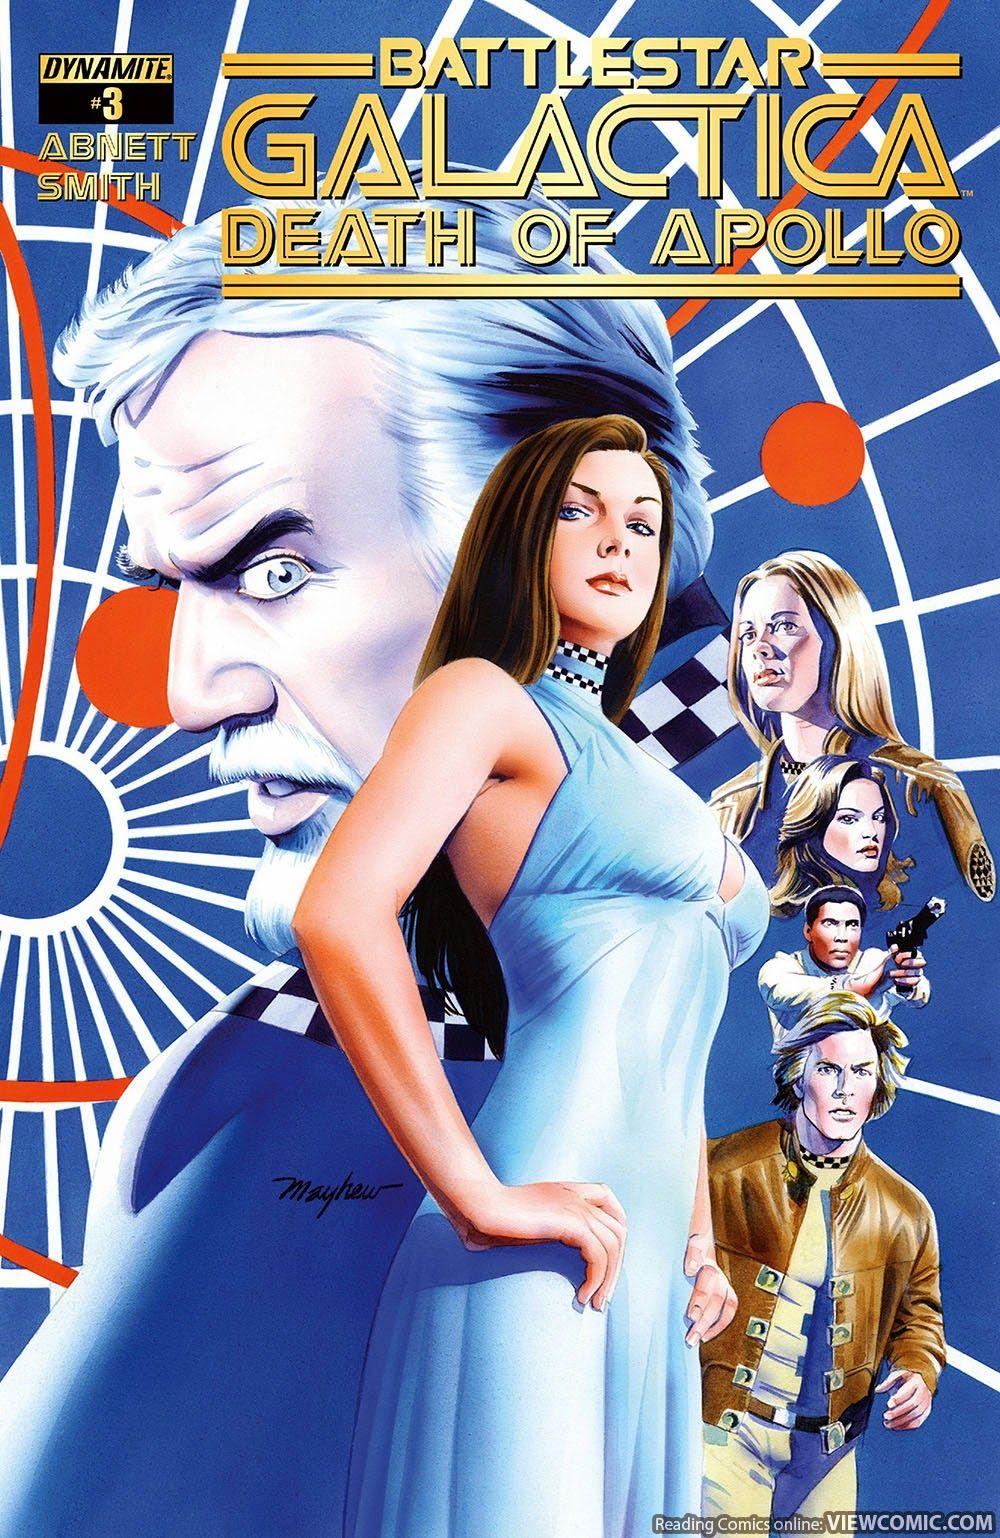 Battlestar Galactica – The Death of Apollo 003 (2015) W.B.